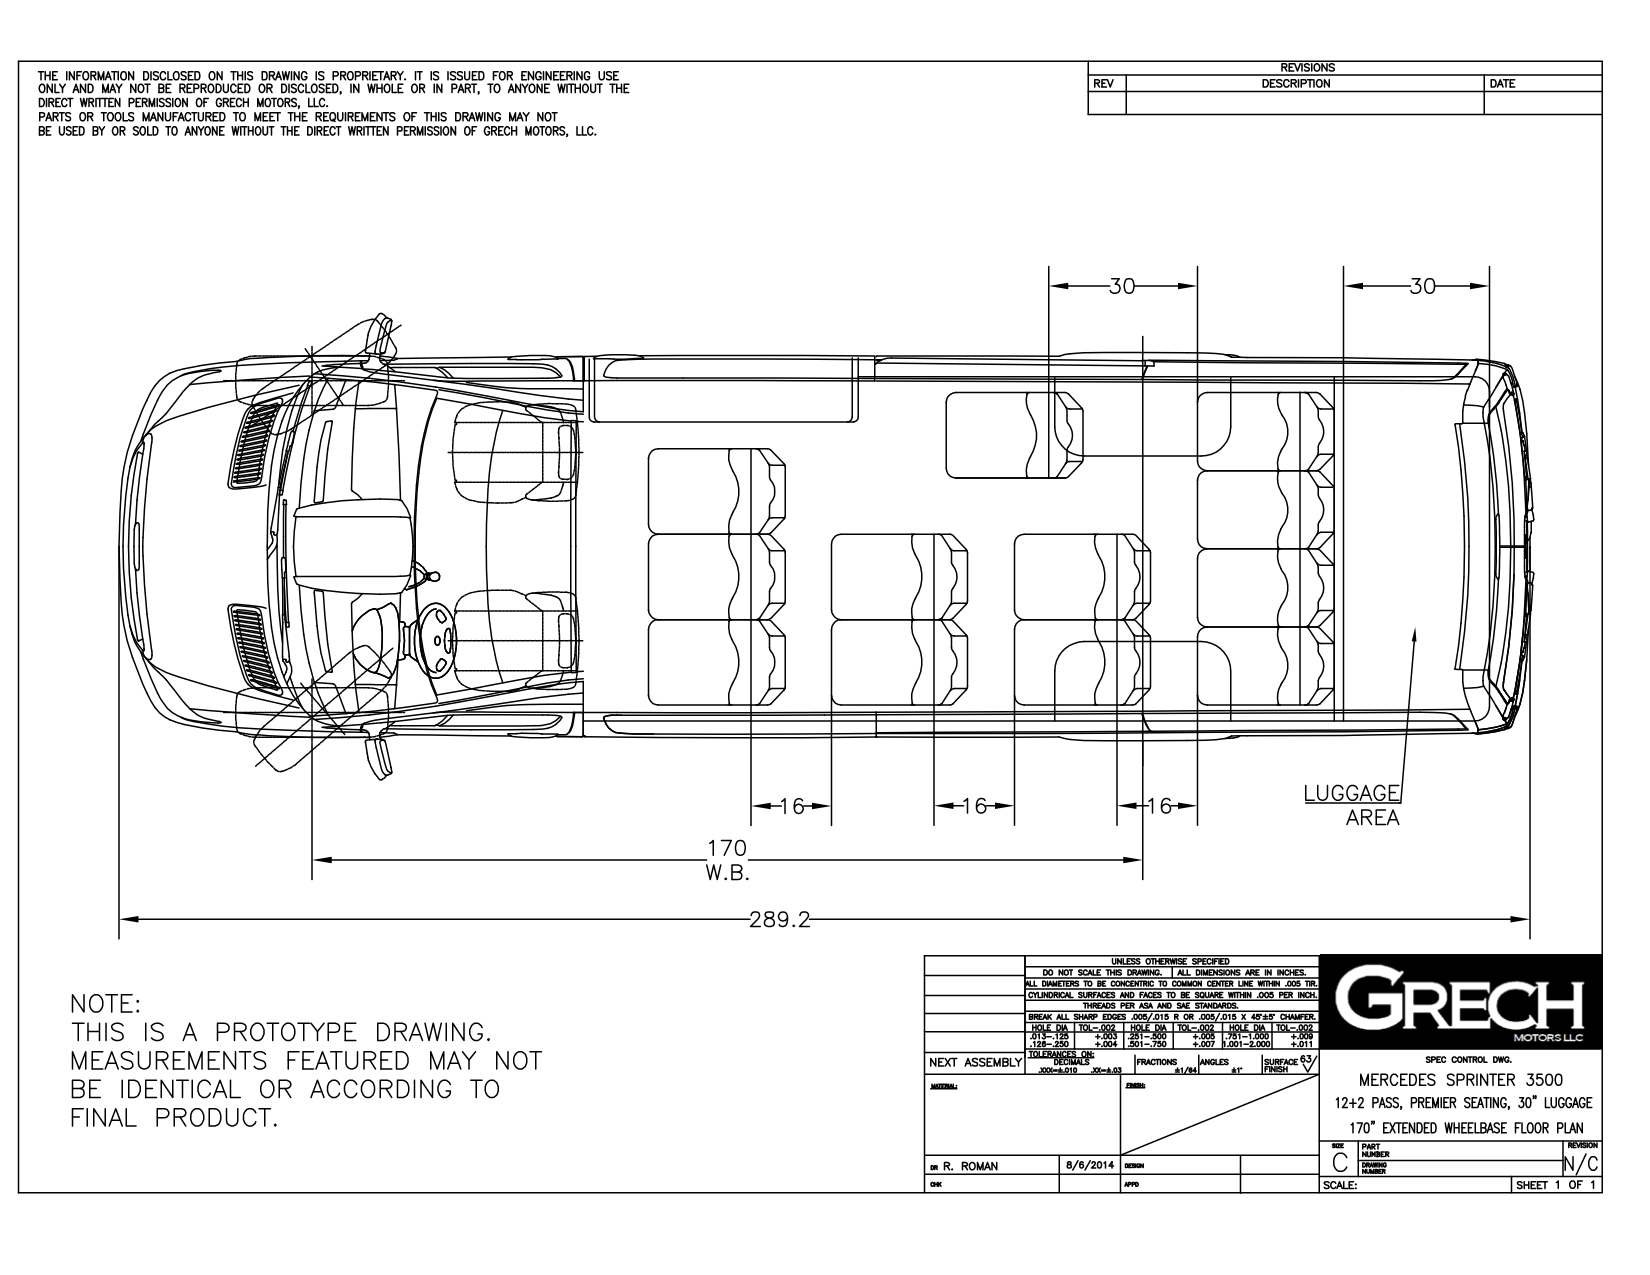 Grech Motors Shuttle Sprinter floor plan